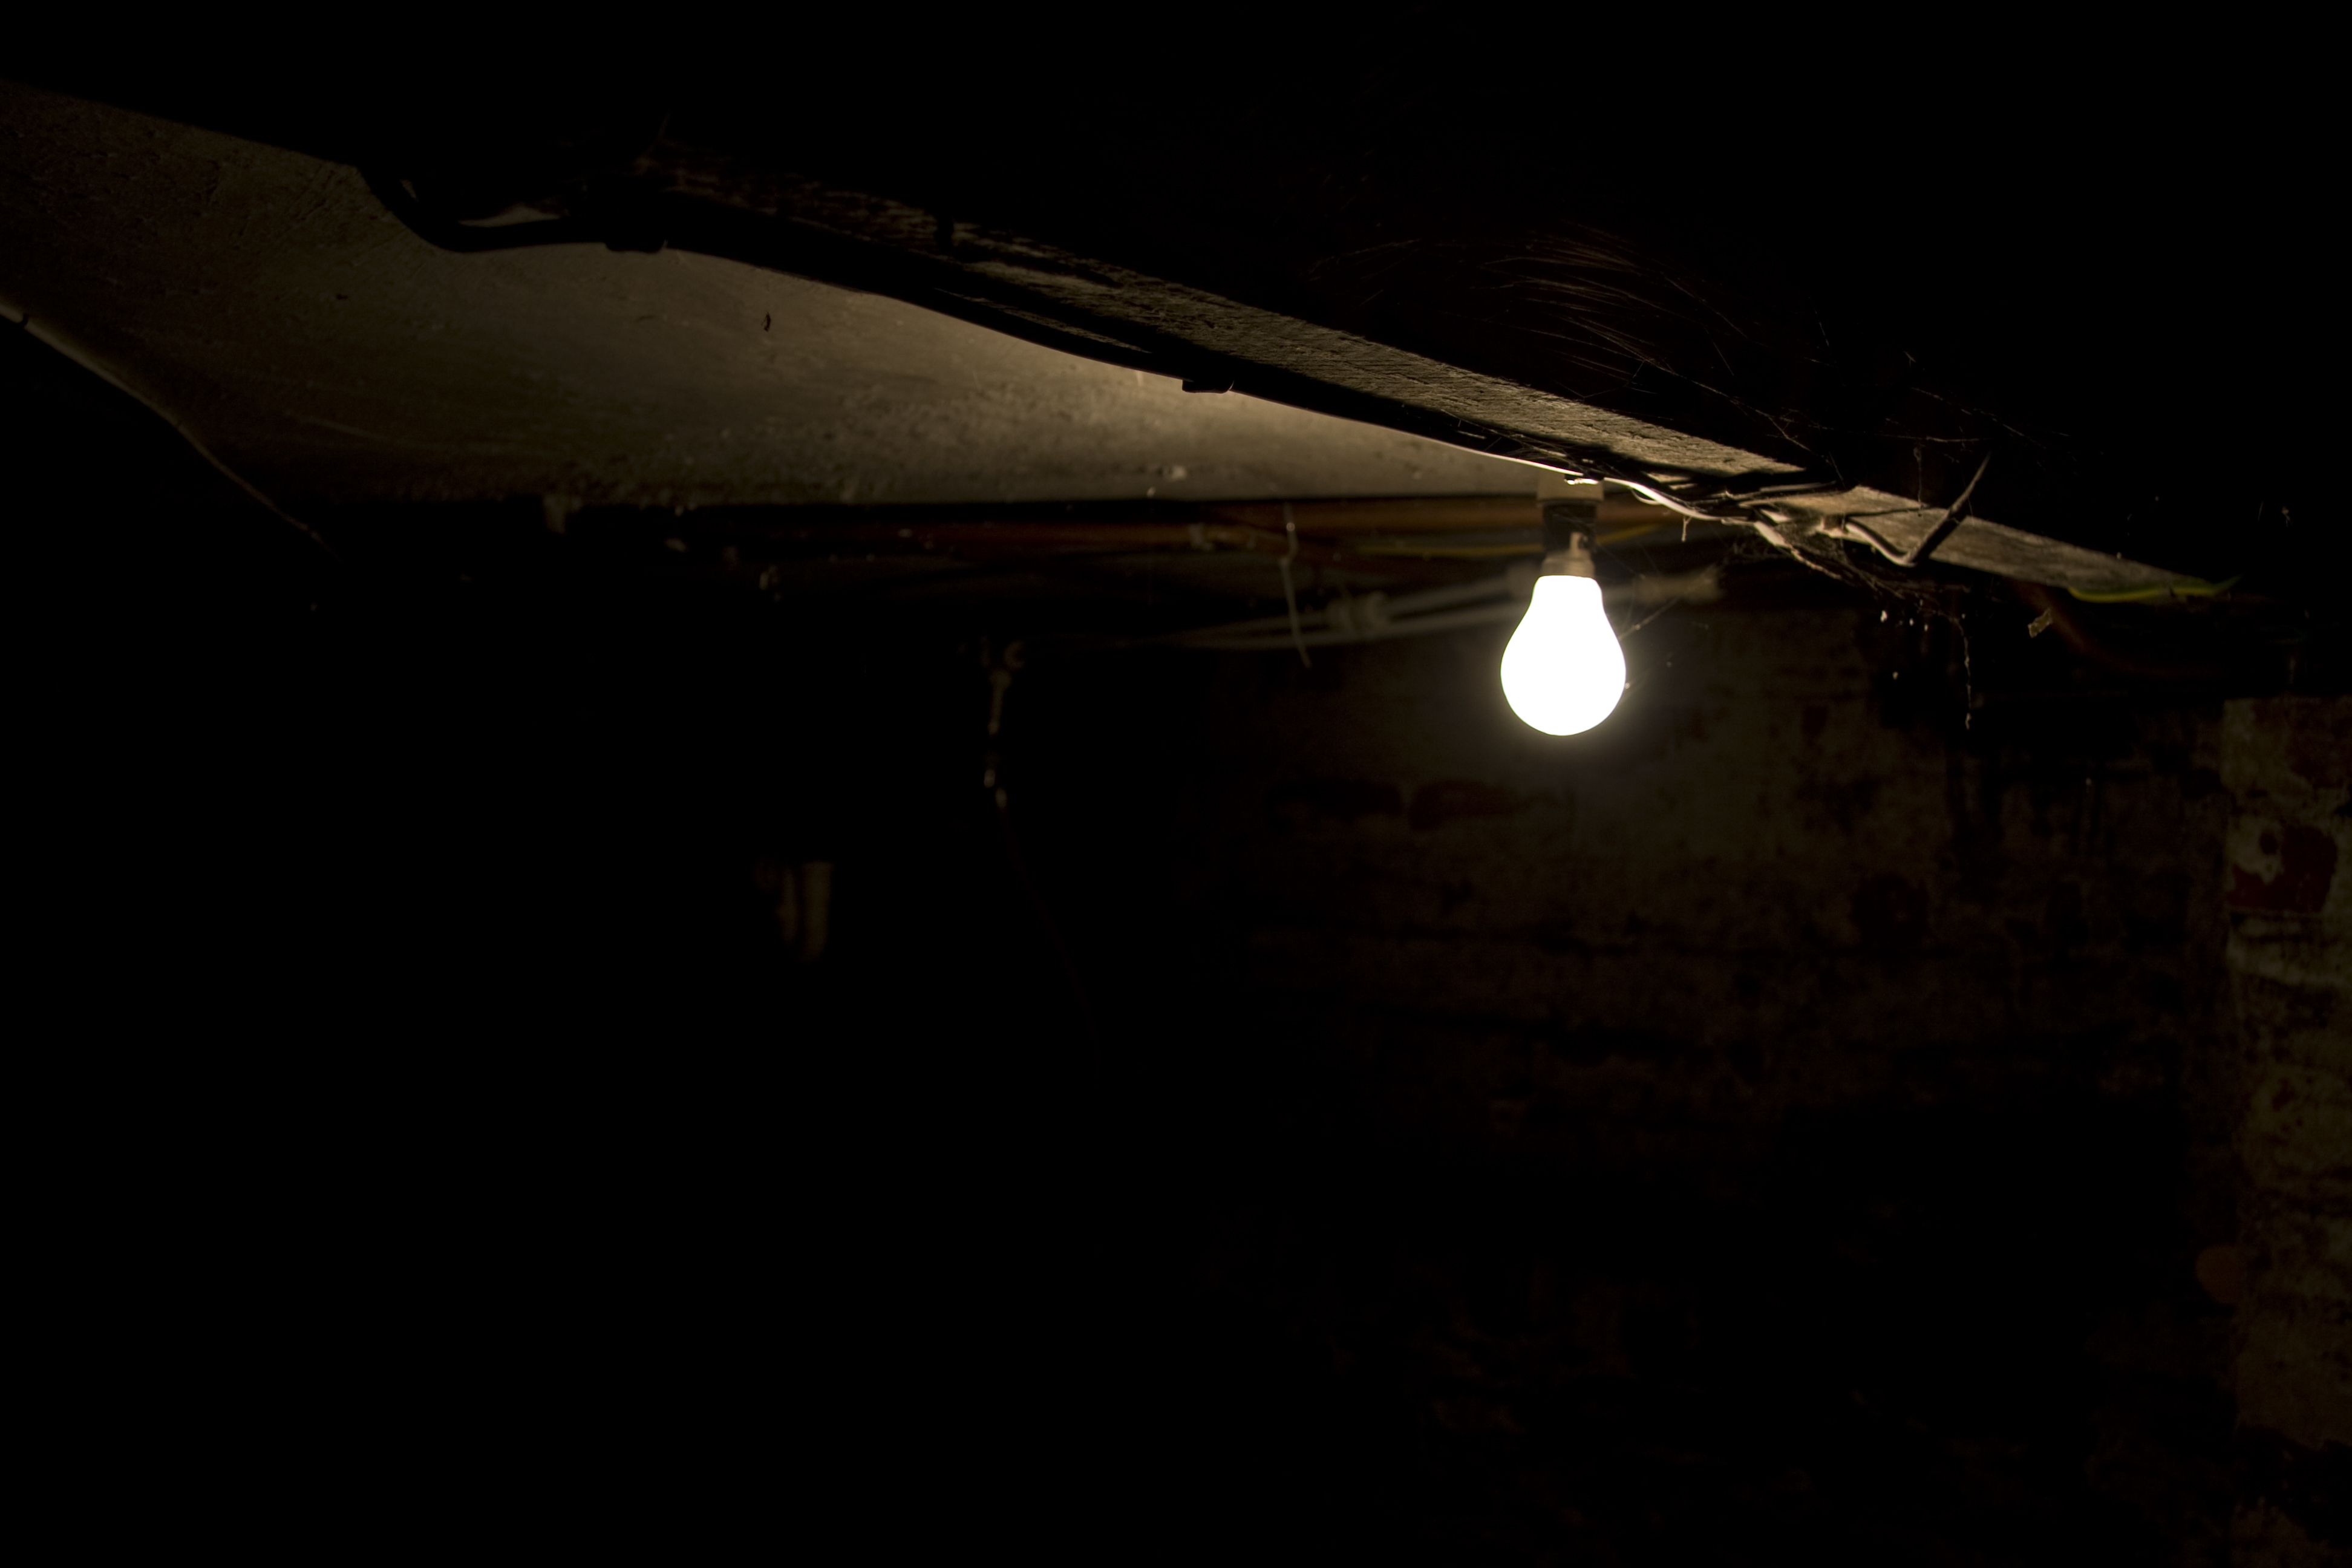 Dark room with light bulb - Hd Wallpaper Background Id 63519 3888x2592 Man Made Light Bulb